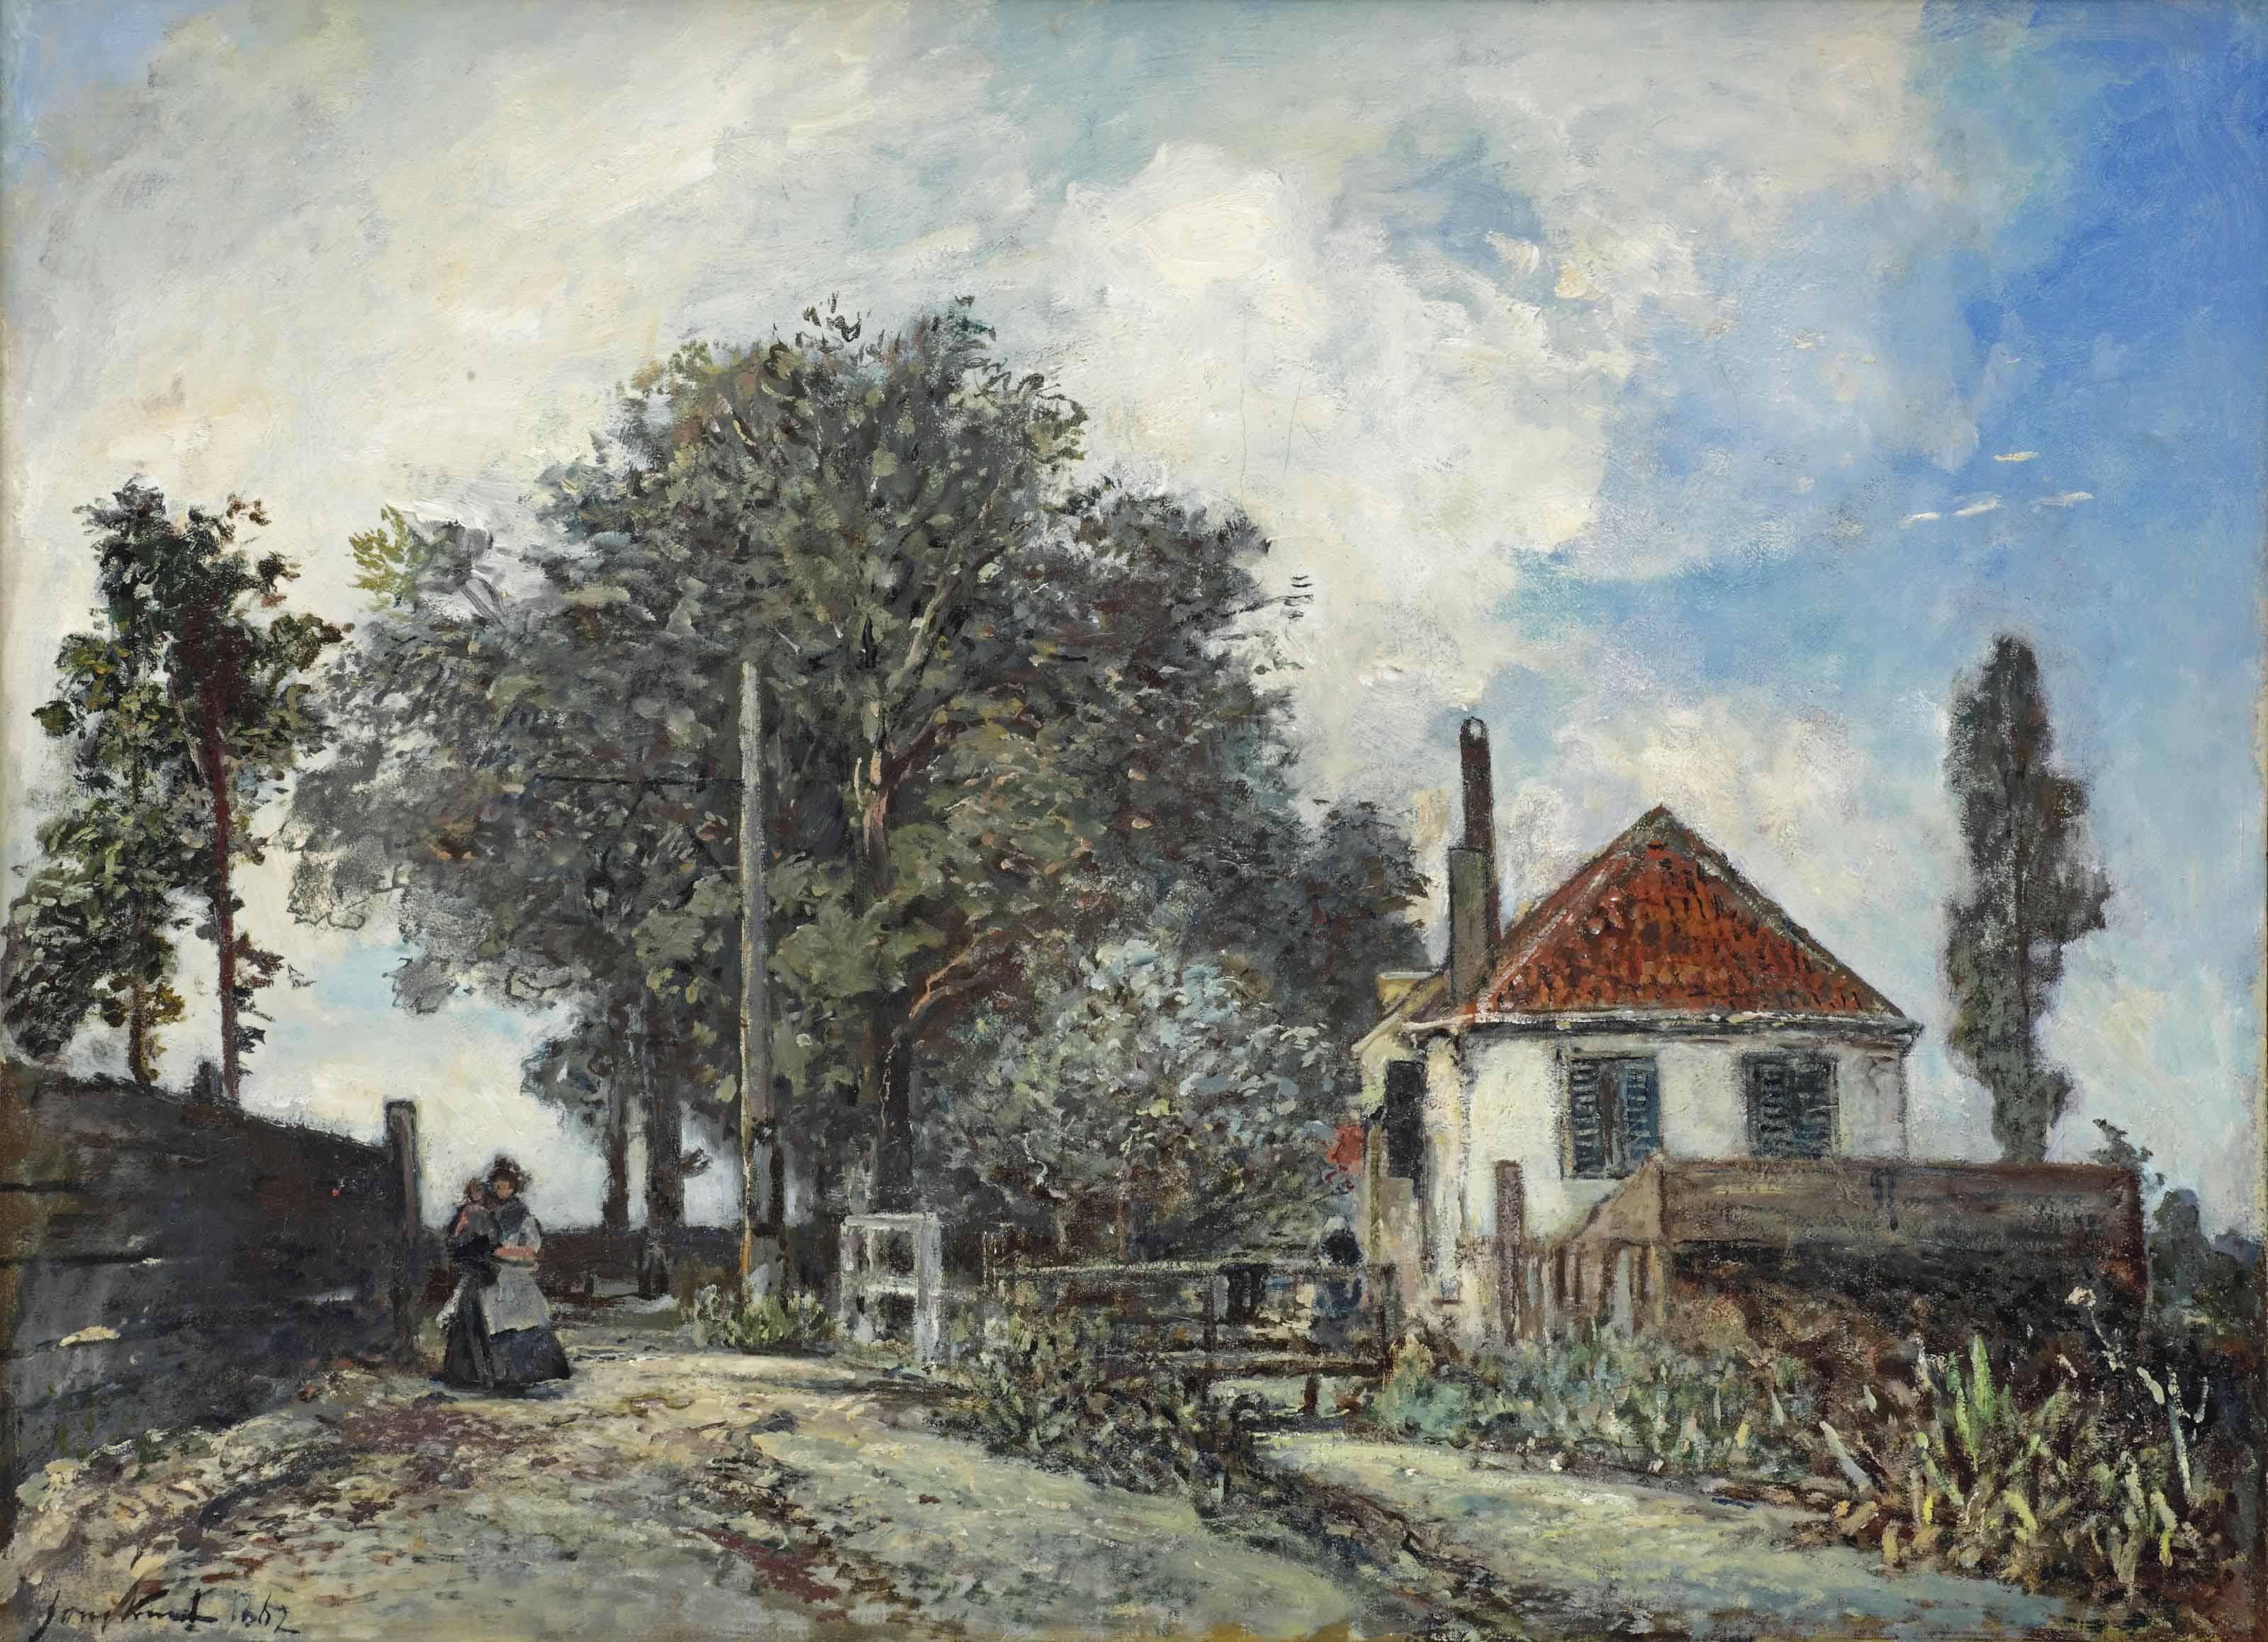 Johan Barthold Jongkind (Lattrop 1819-1891 La Côte-Saint-André)